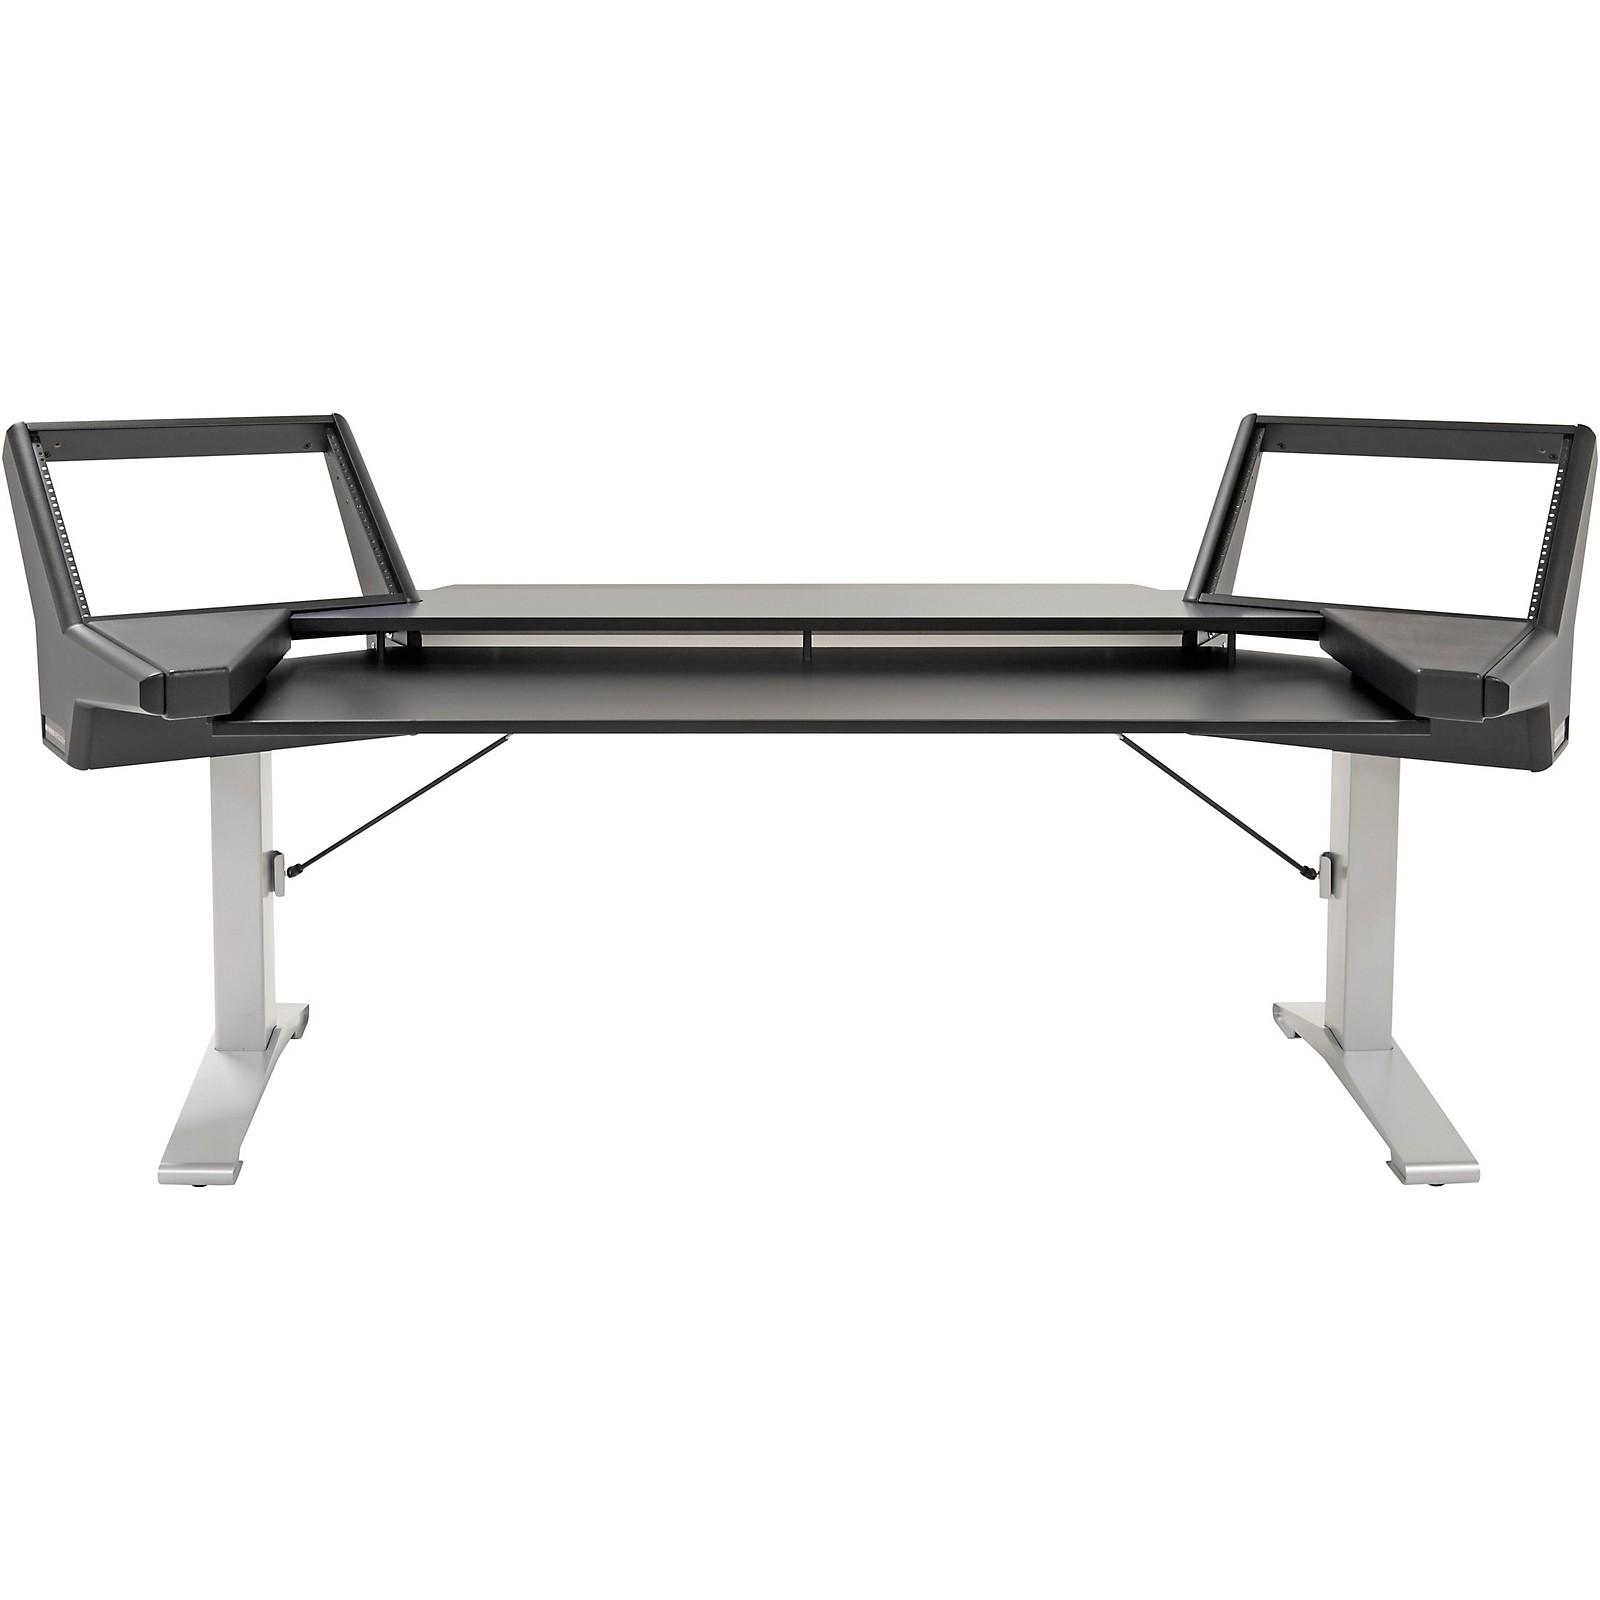 Argosy Halo K88 Keyboard Desk